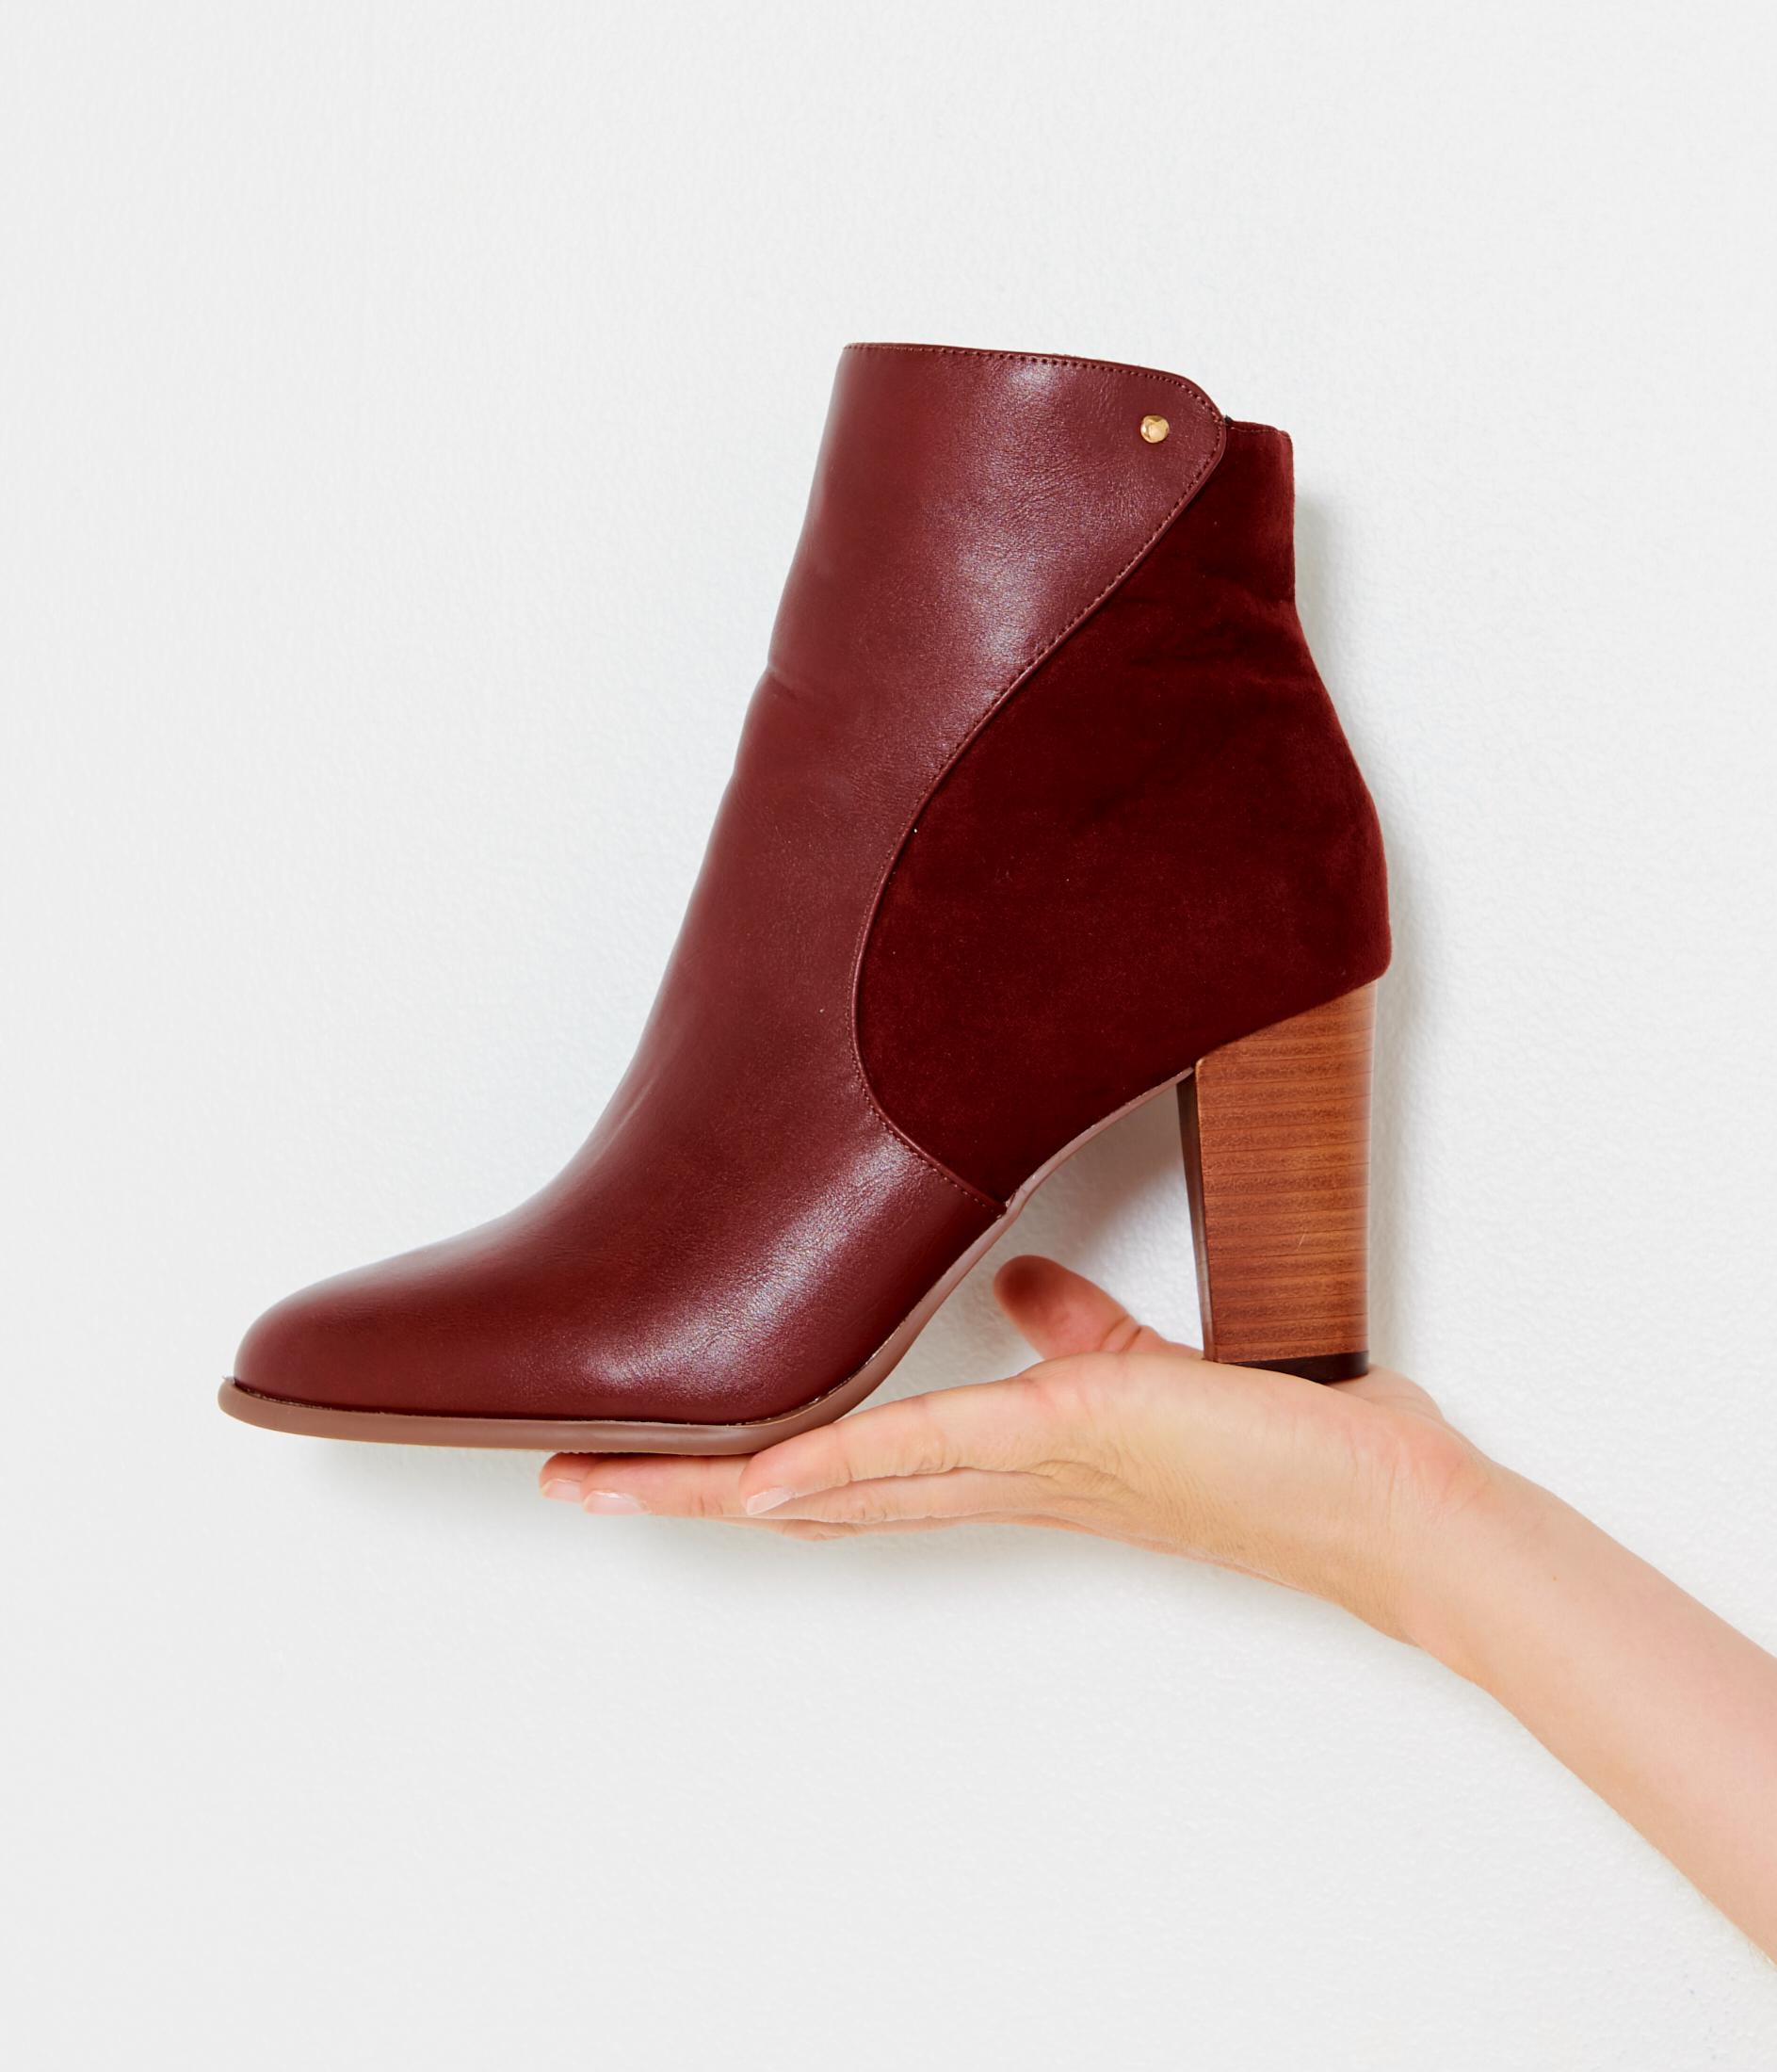 Bi À Boots Talons Camaïeu Femme matière 7gbf6vYy